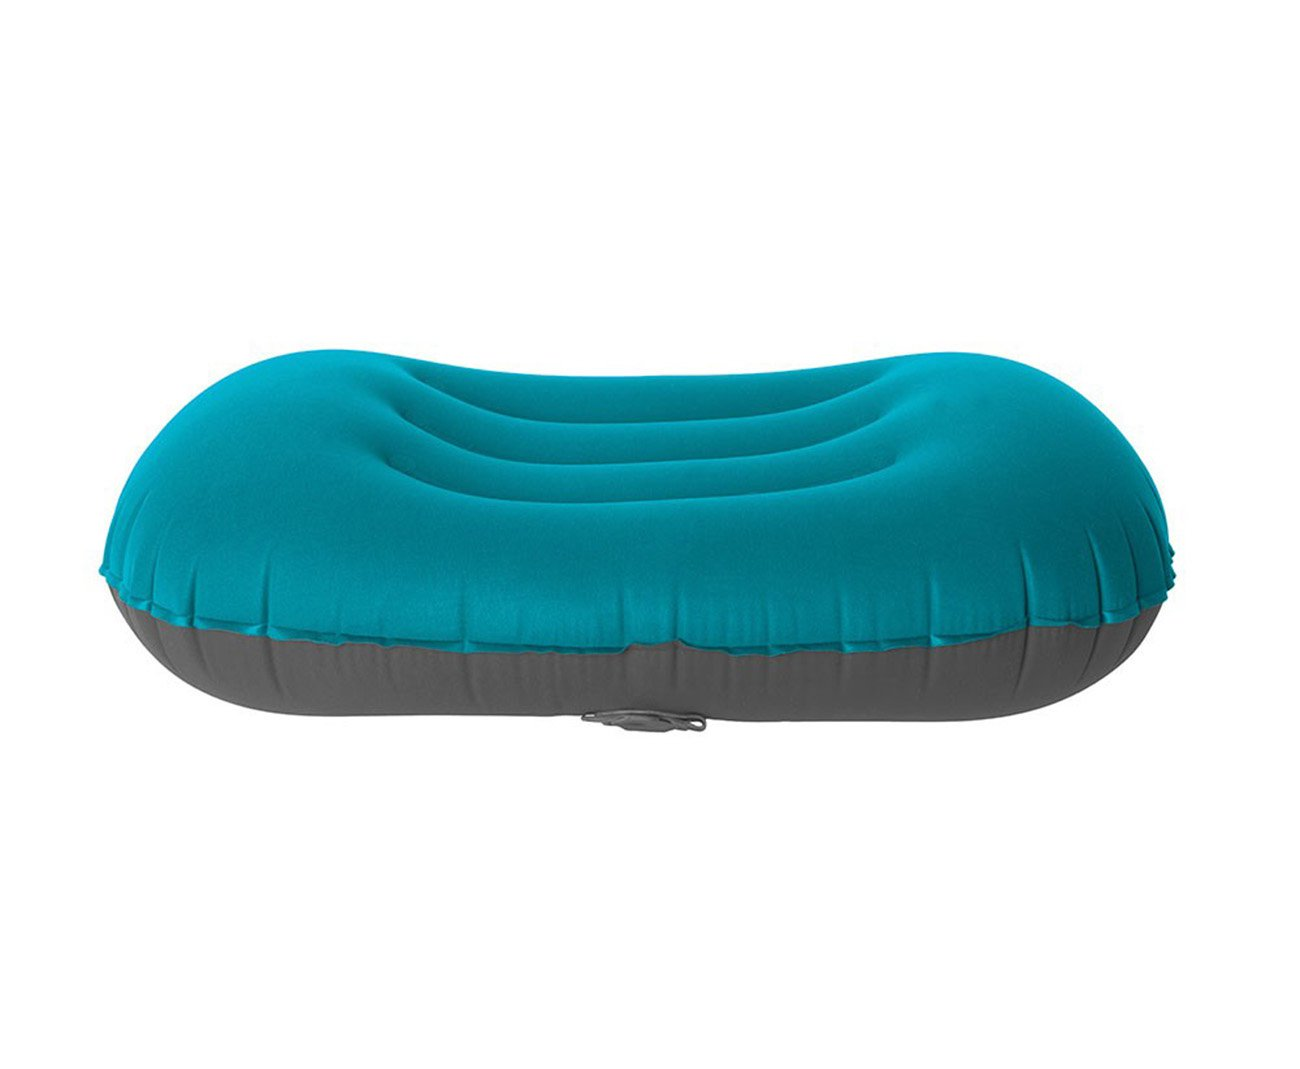 Travesseiro Sea To Summit Pillow Ultralight Large Azul E Cinza